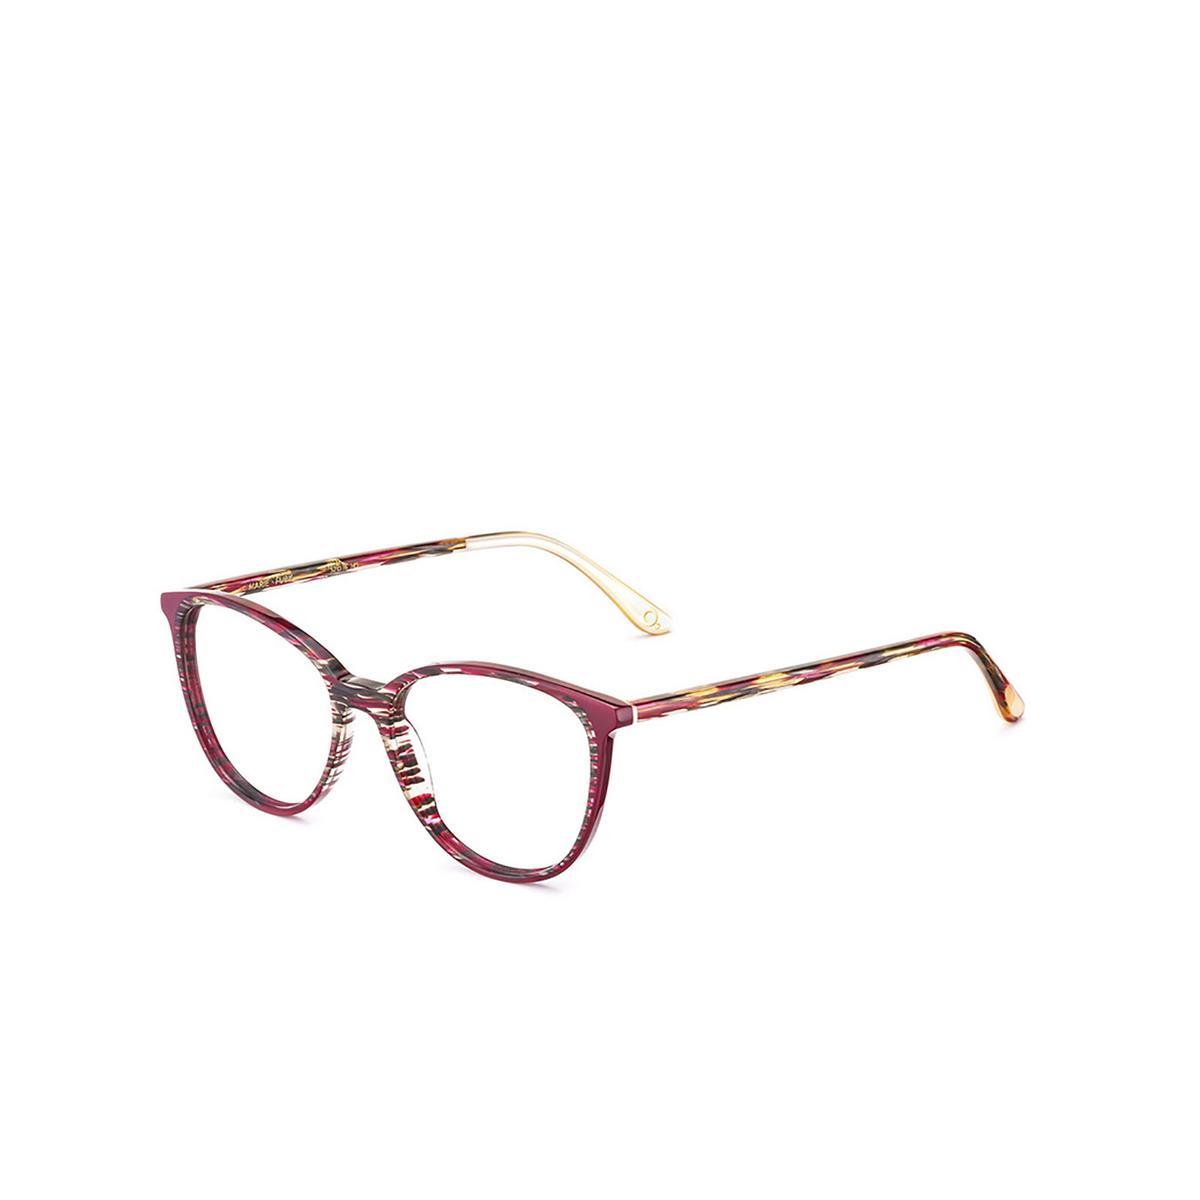 Etnia Barcelona® Butterfly Eyeglasses: Marie color Fubx - three-quarters view.